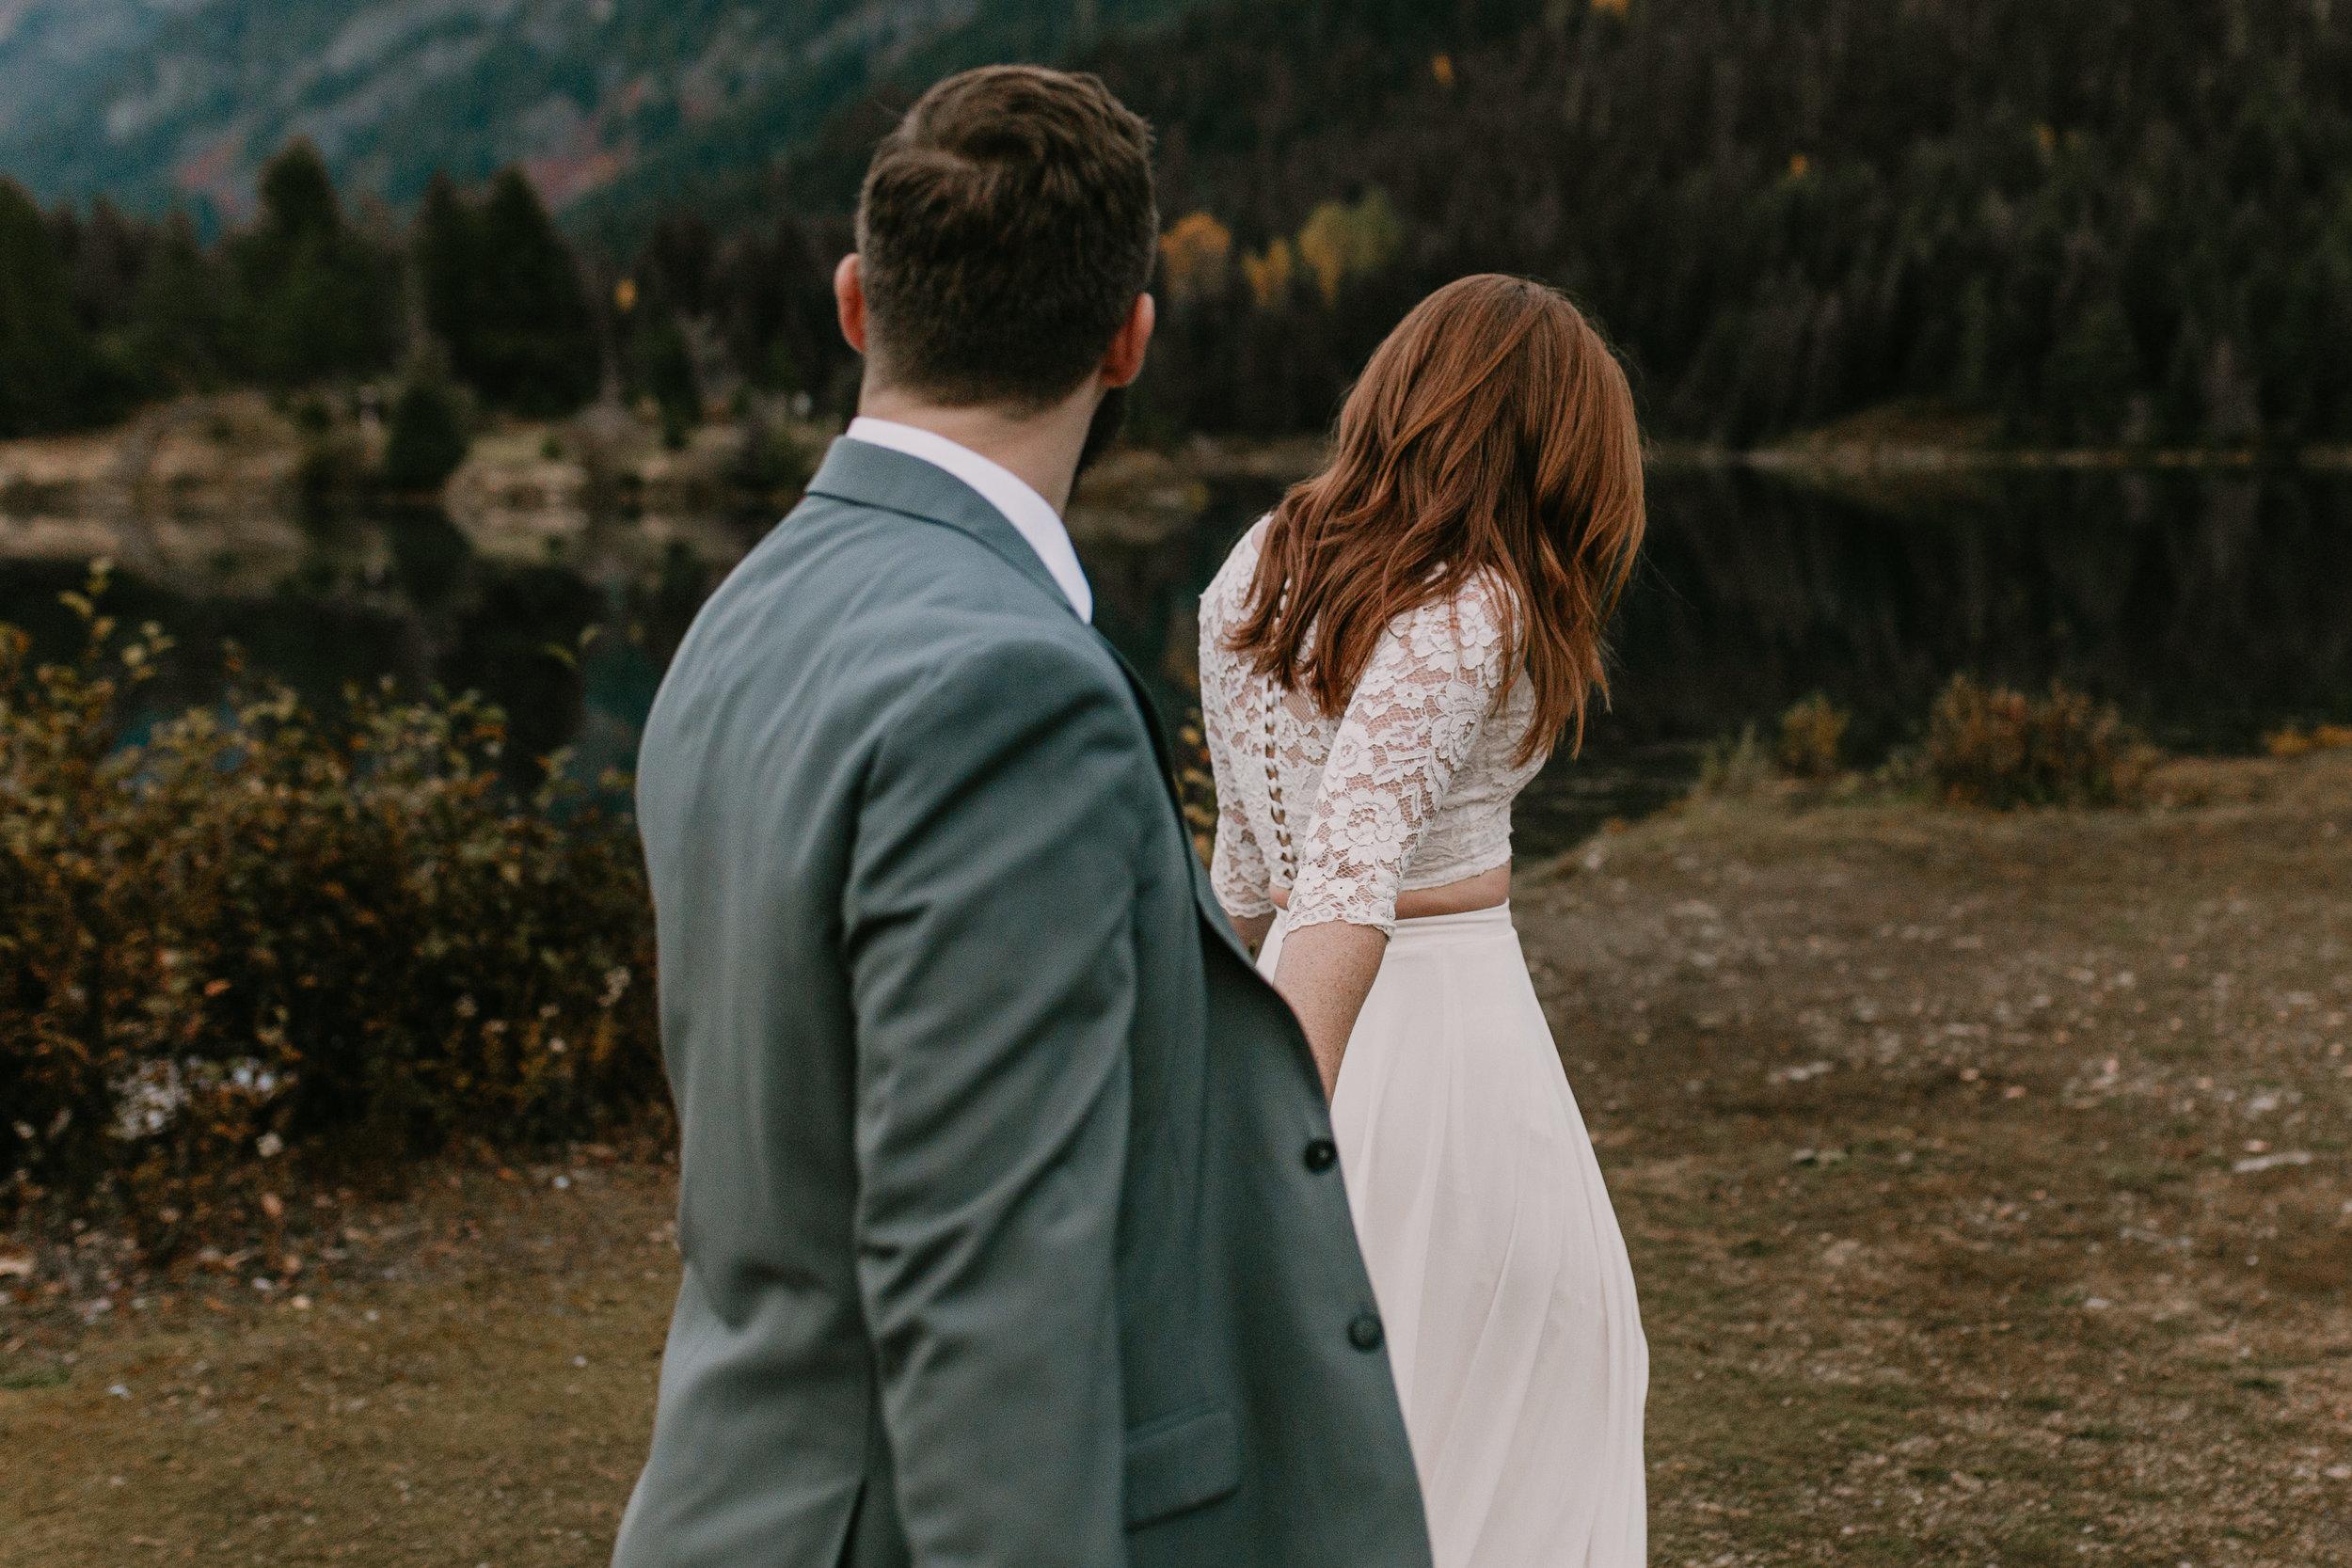 nicole-daacke-photography-mountain-view-elopement-at-gold-creek-pond-snoqualmie-washington-wa-elopement-photographer-photography-adventure-elopement-in-washington-fall-lakeside-golden-sunset-boho-fun-bride-0663.jpg